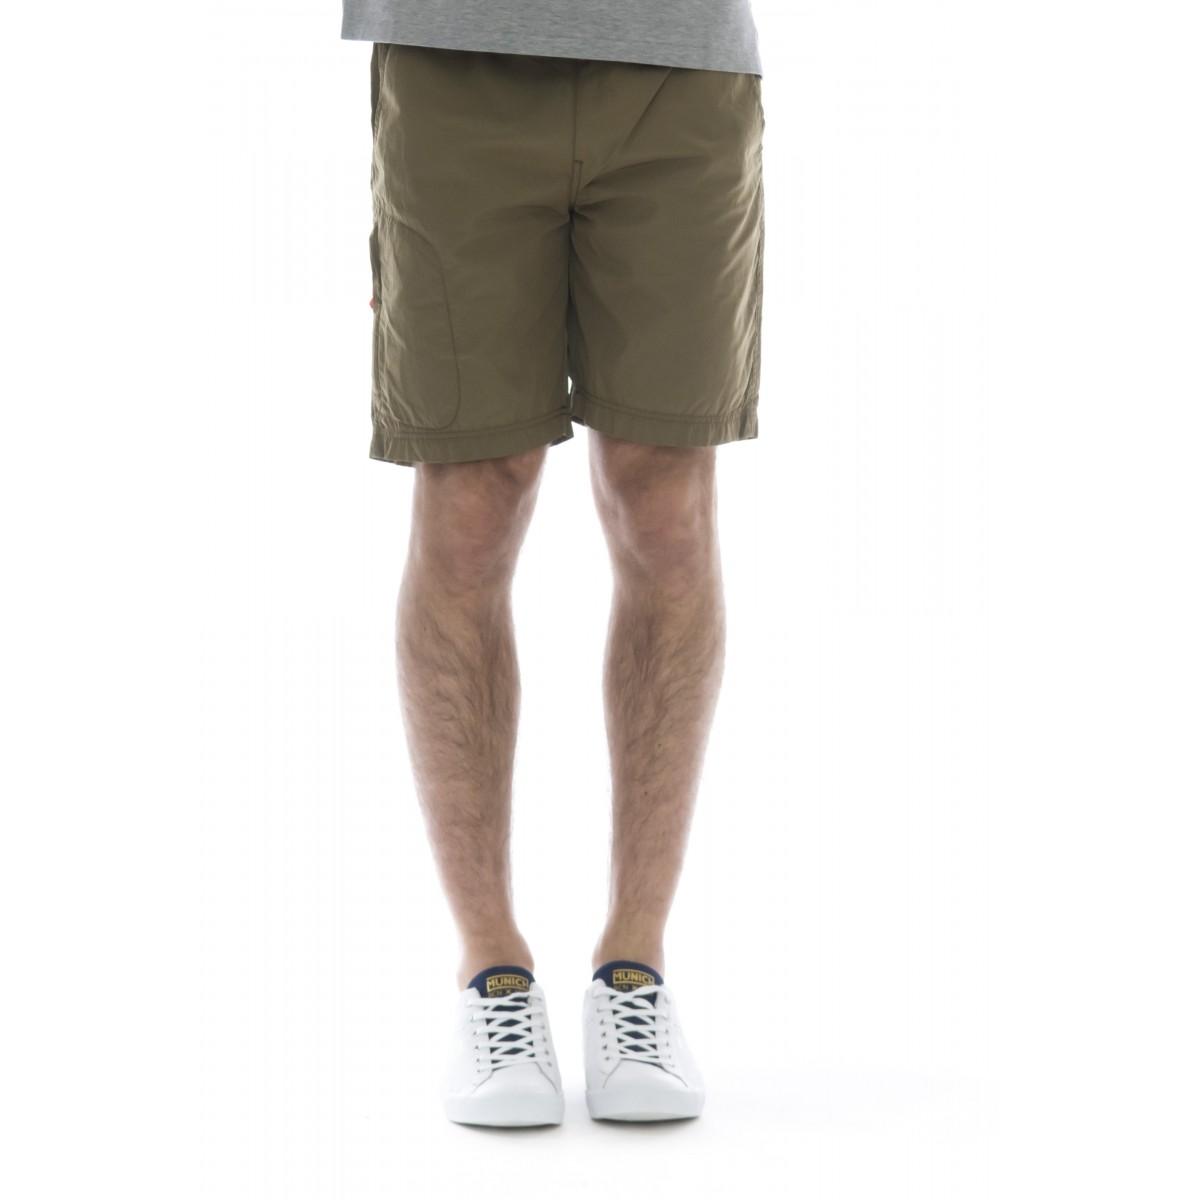 Bermuda uomo - M802 amphibian shorts np23